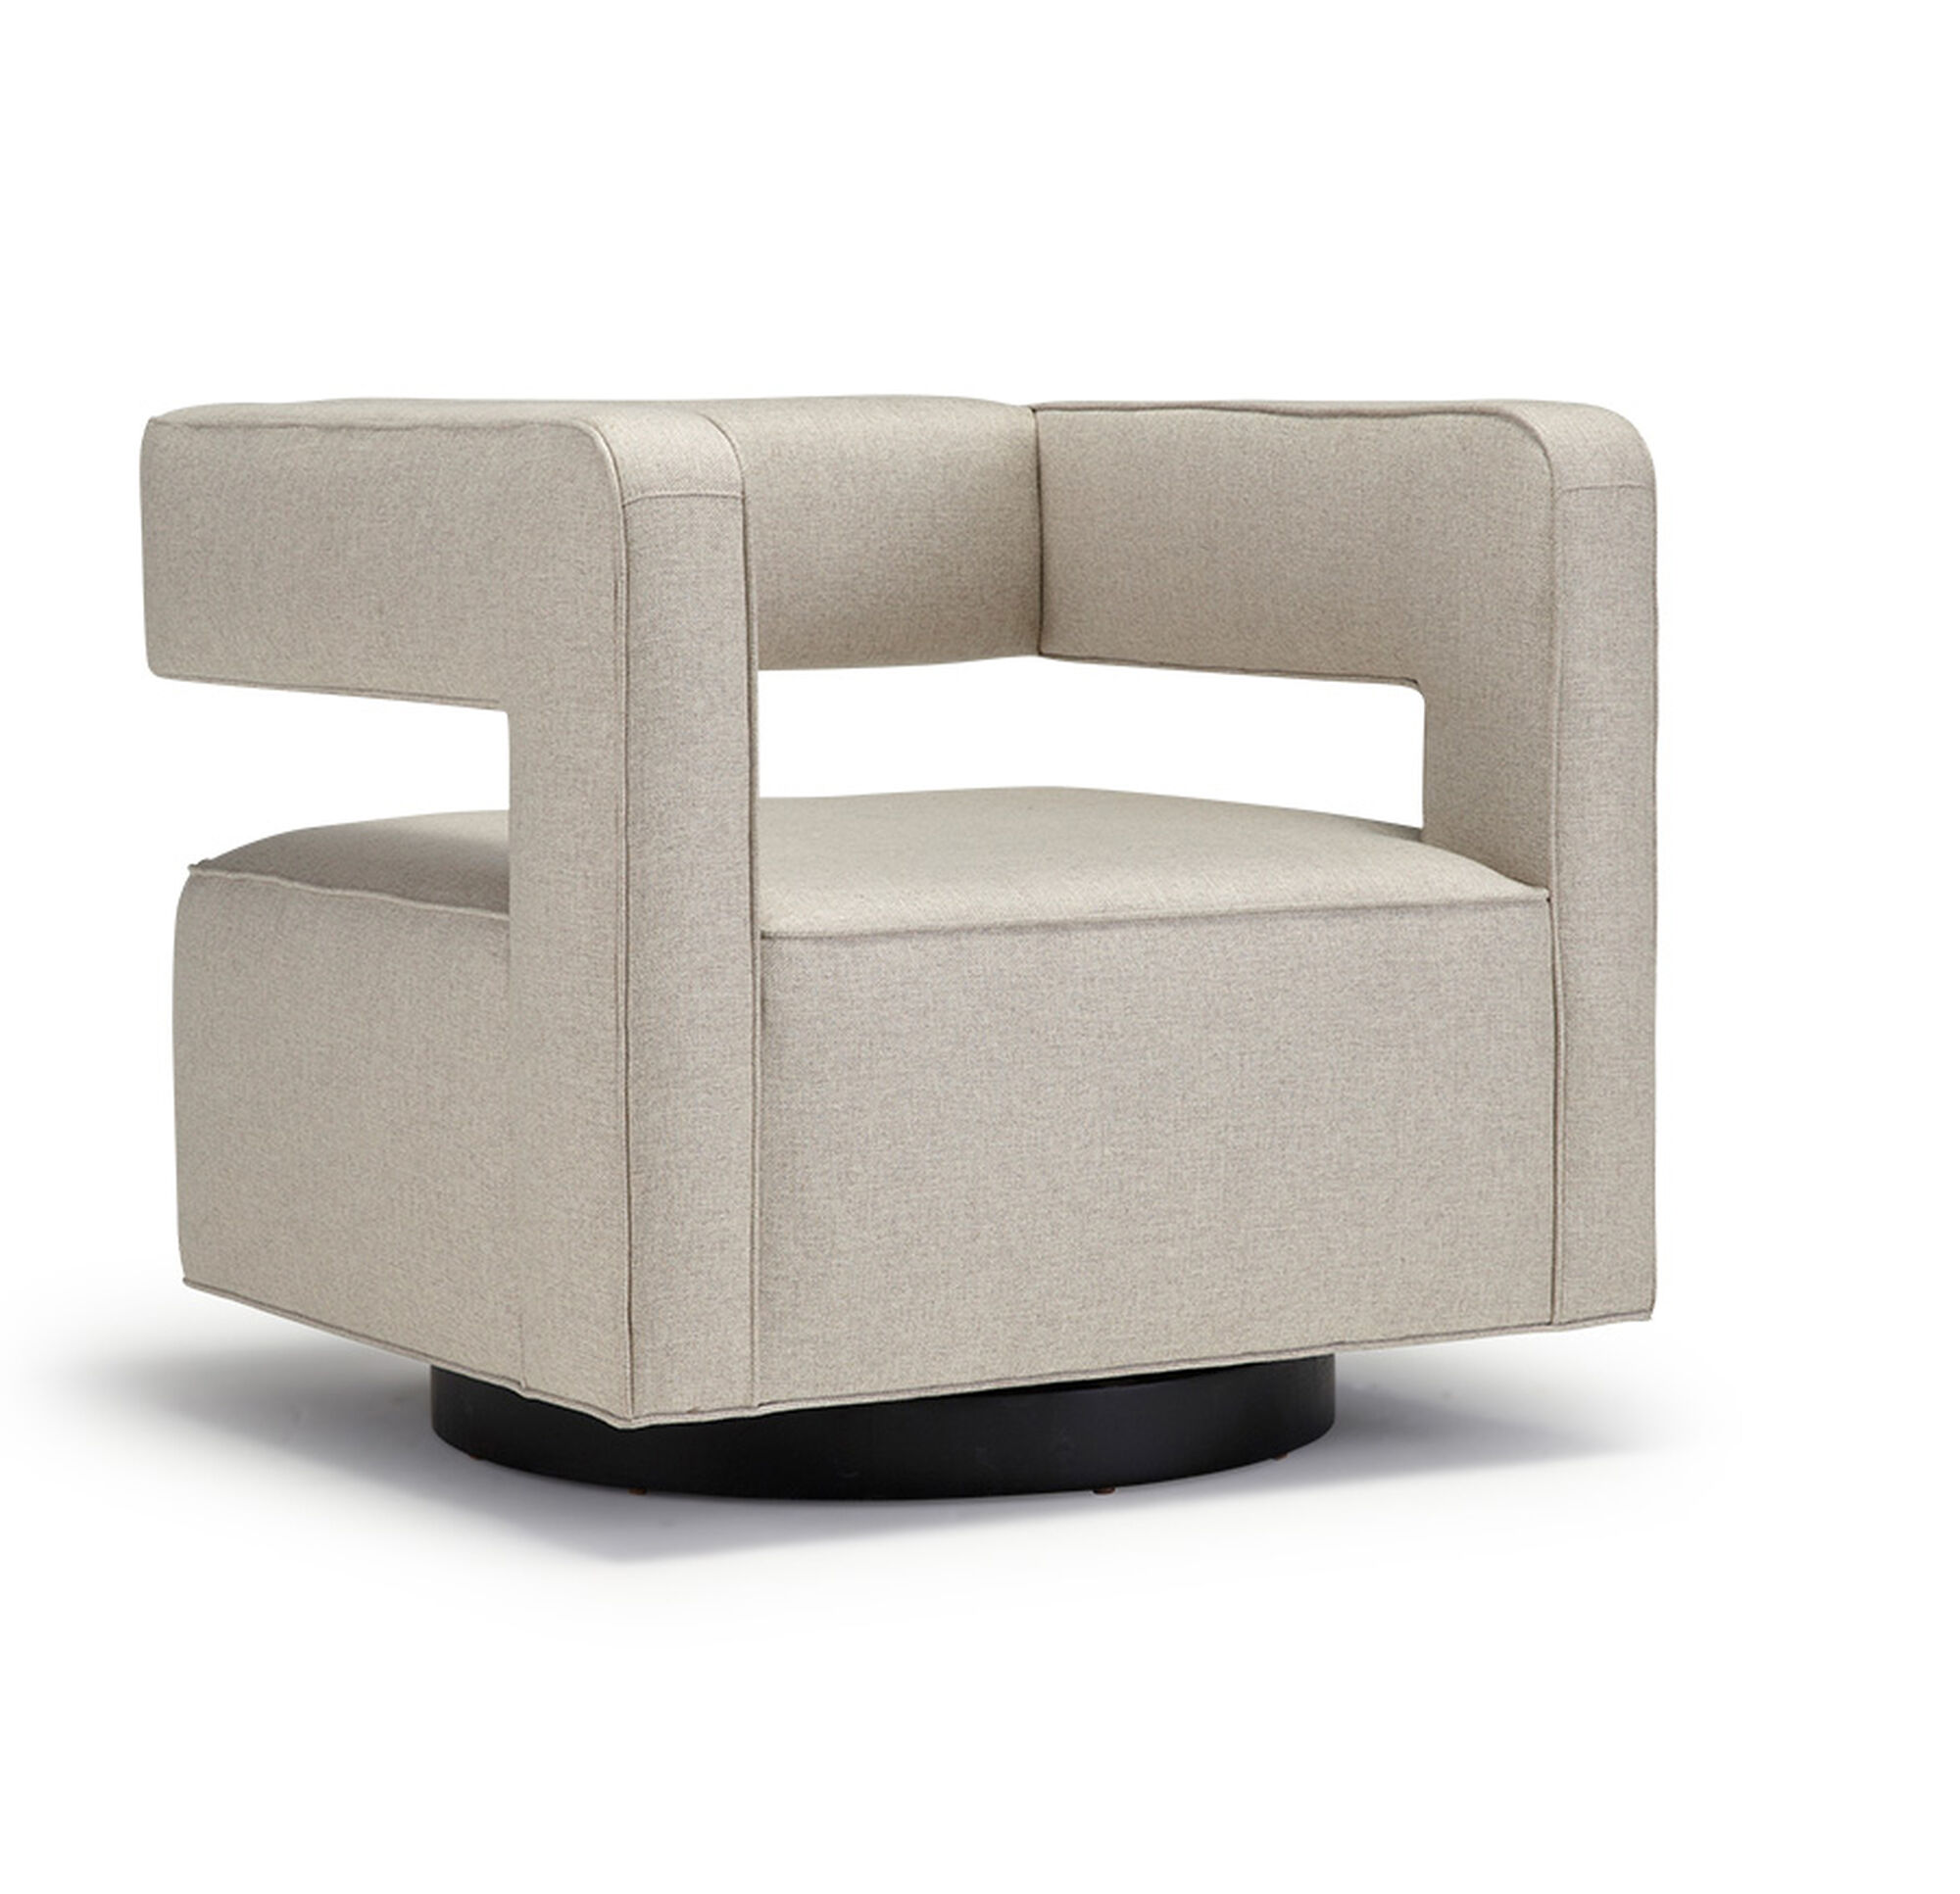 NICO RETURN SWIVEL CHAIR. Nico Counter Height Dining Stool. Home Design Ideas